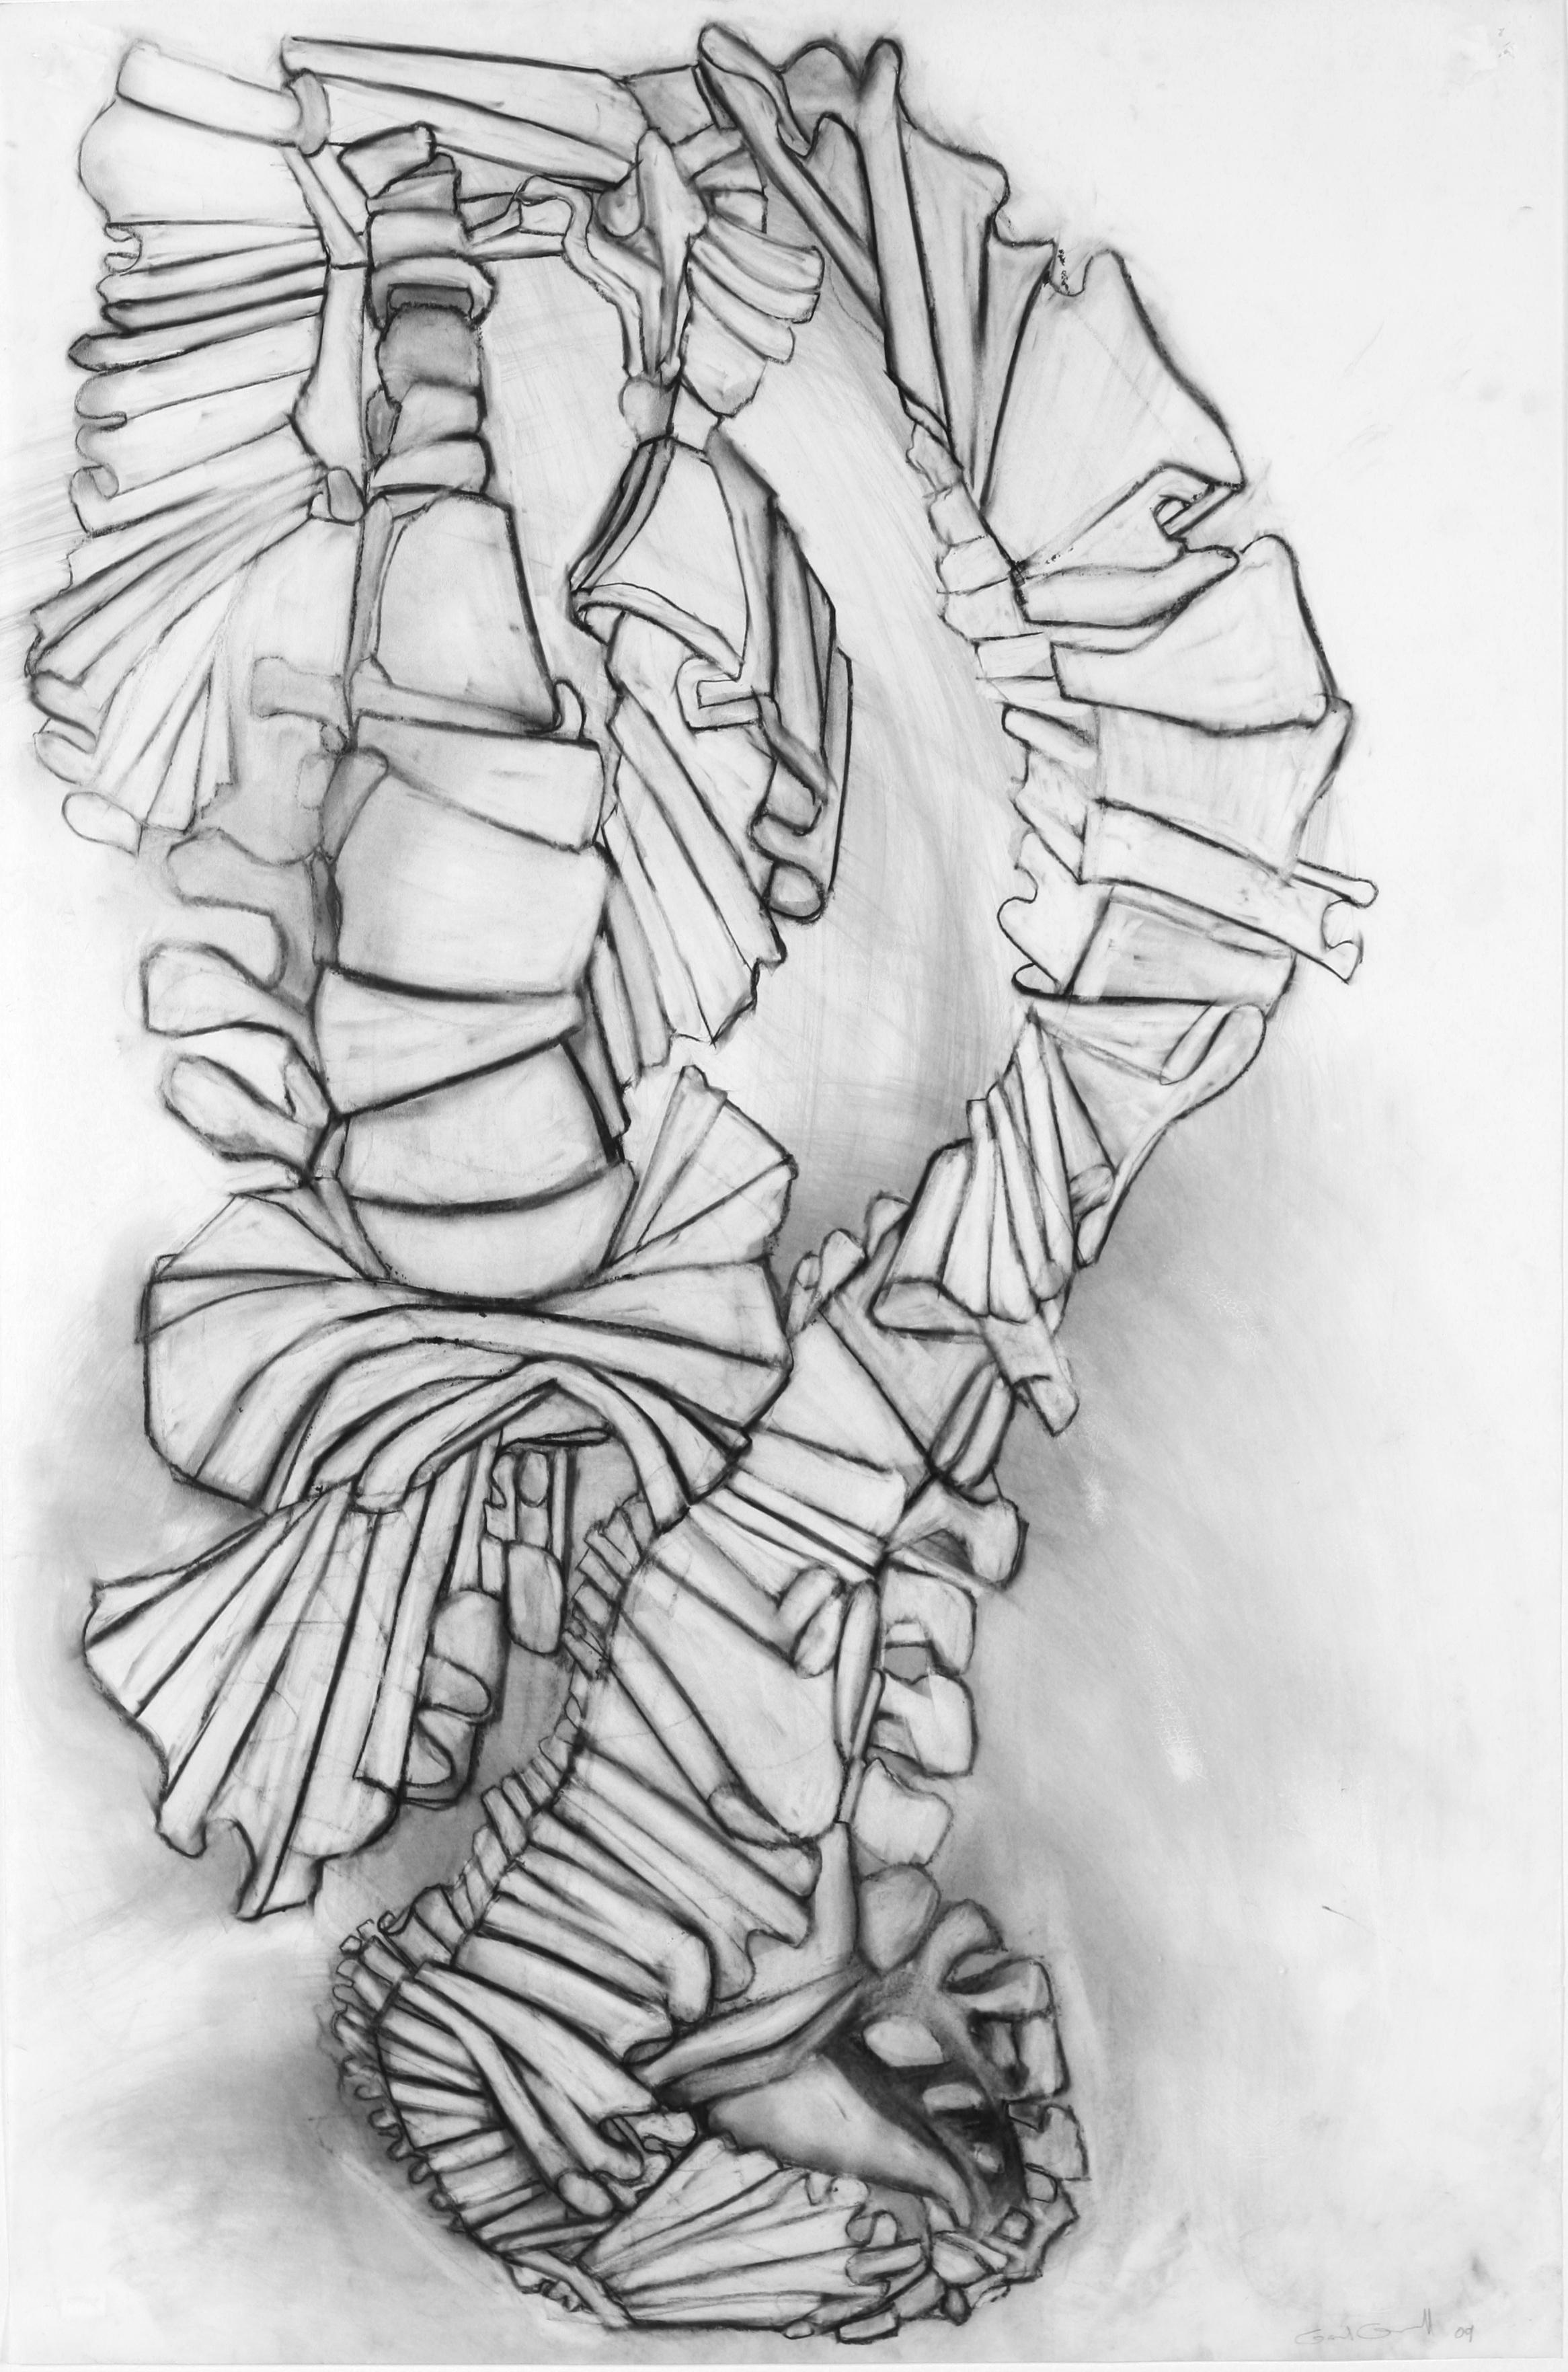 "Ruffle Study 4 33"" x 24"" charcoal on vellum"